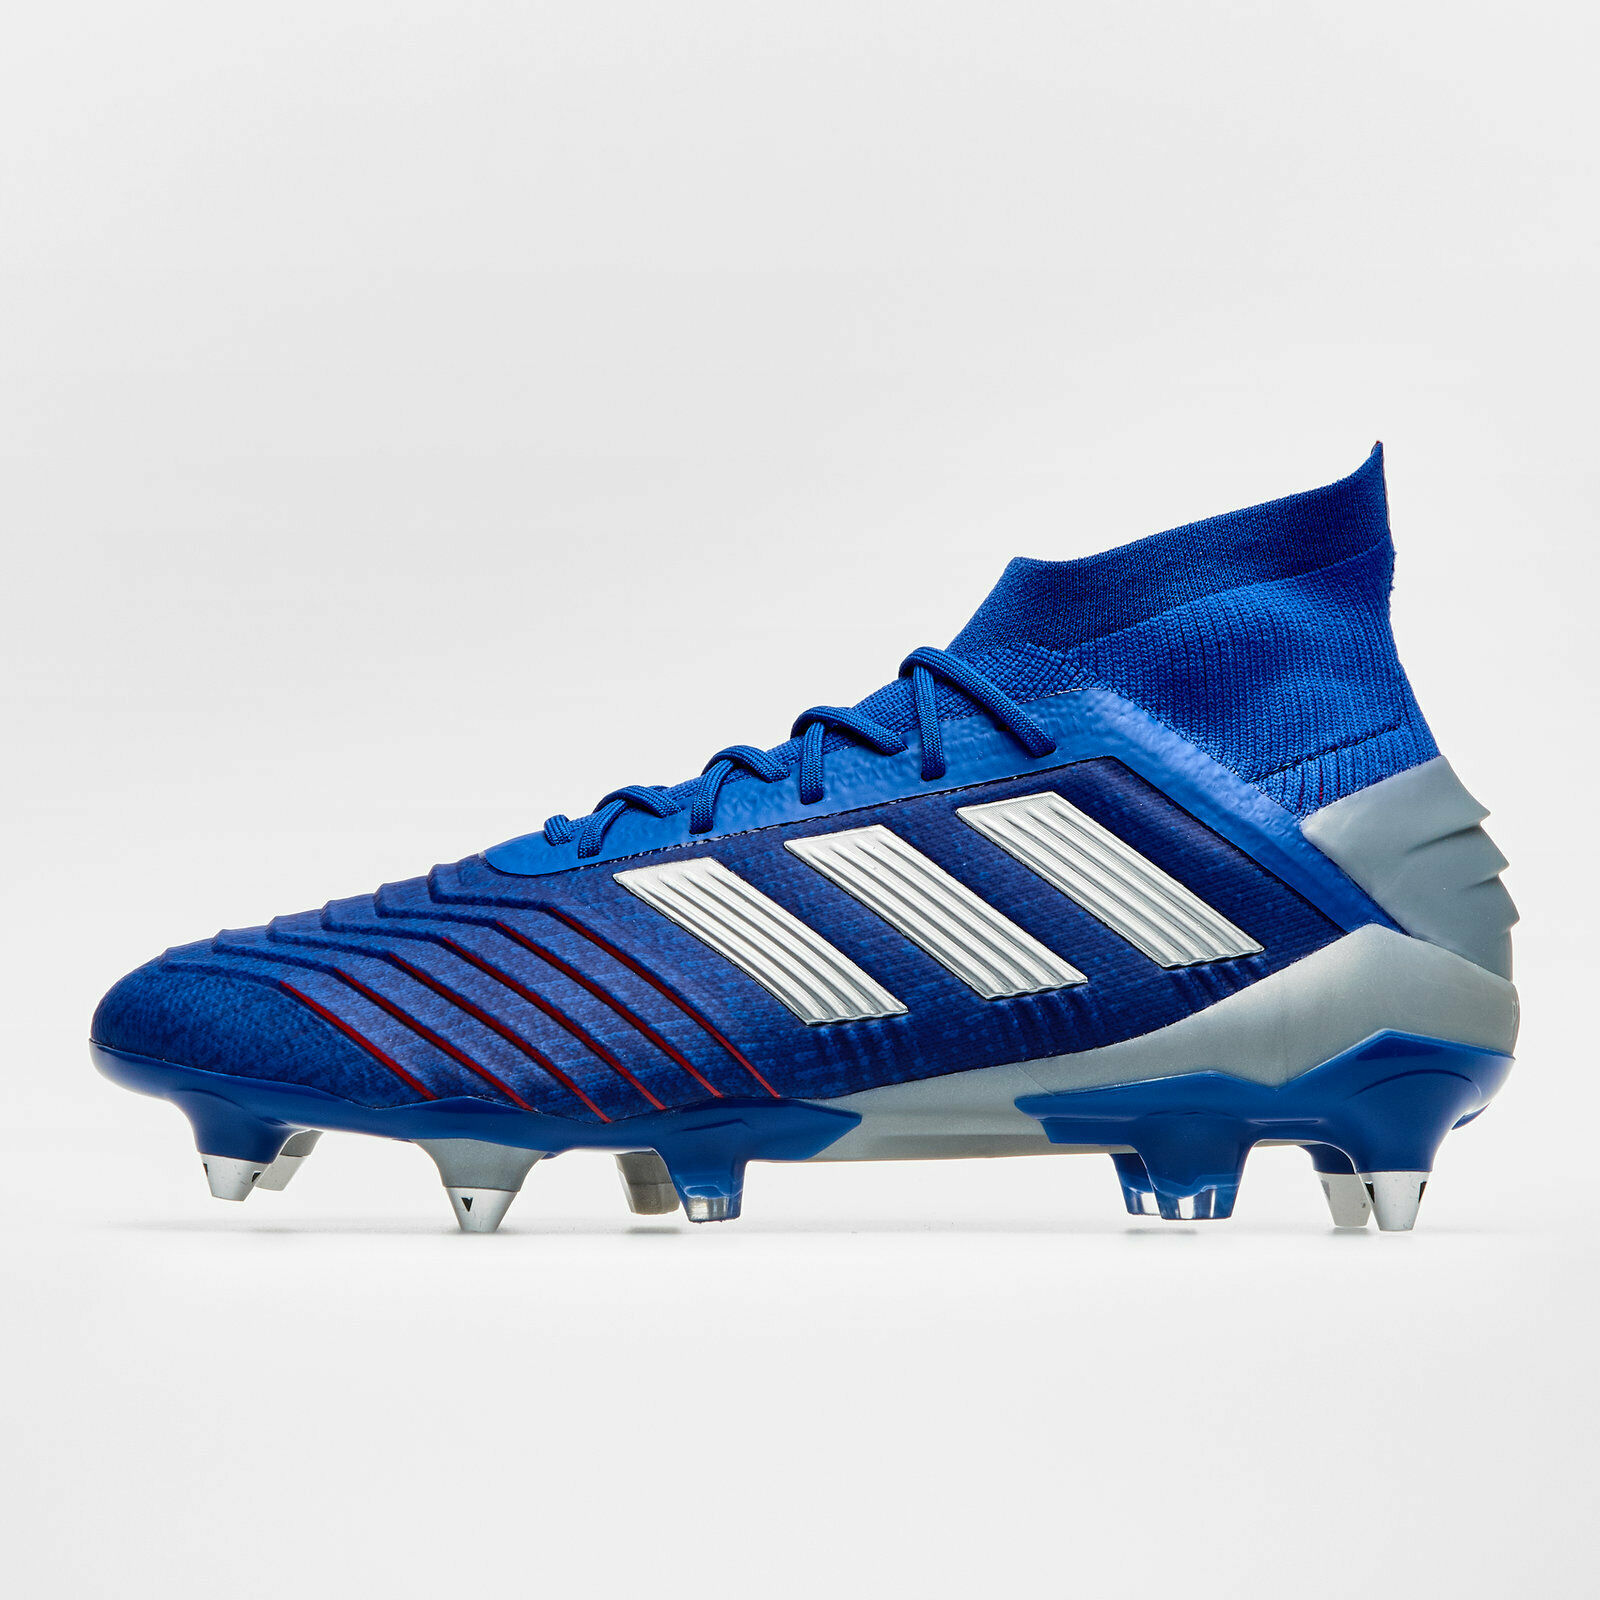 Adidas para hombre Deprojoador 19.1 SG botas De Fútbol Tacos Zapatillas Zapatos Deportivos Azul